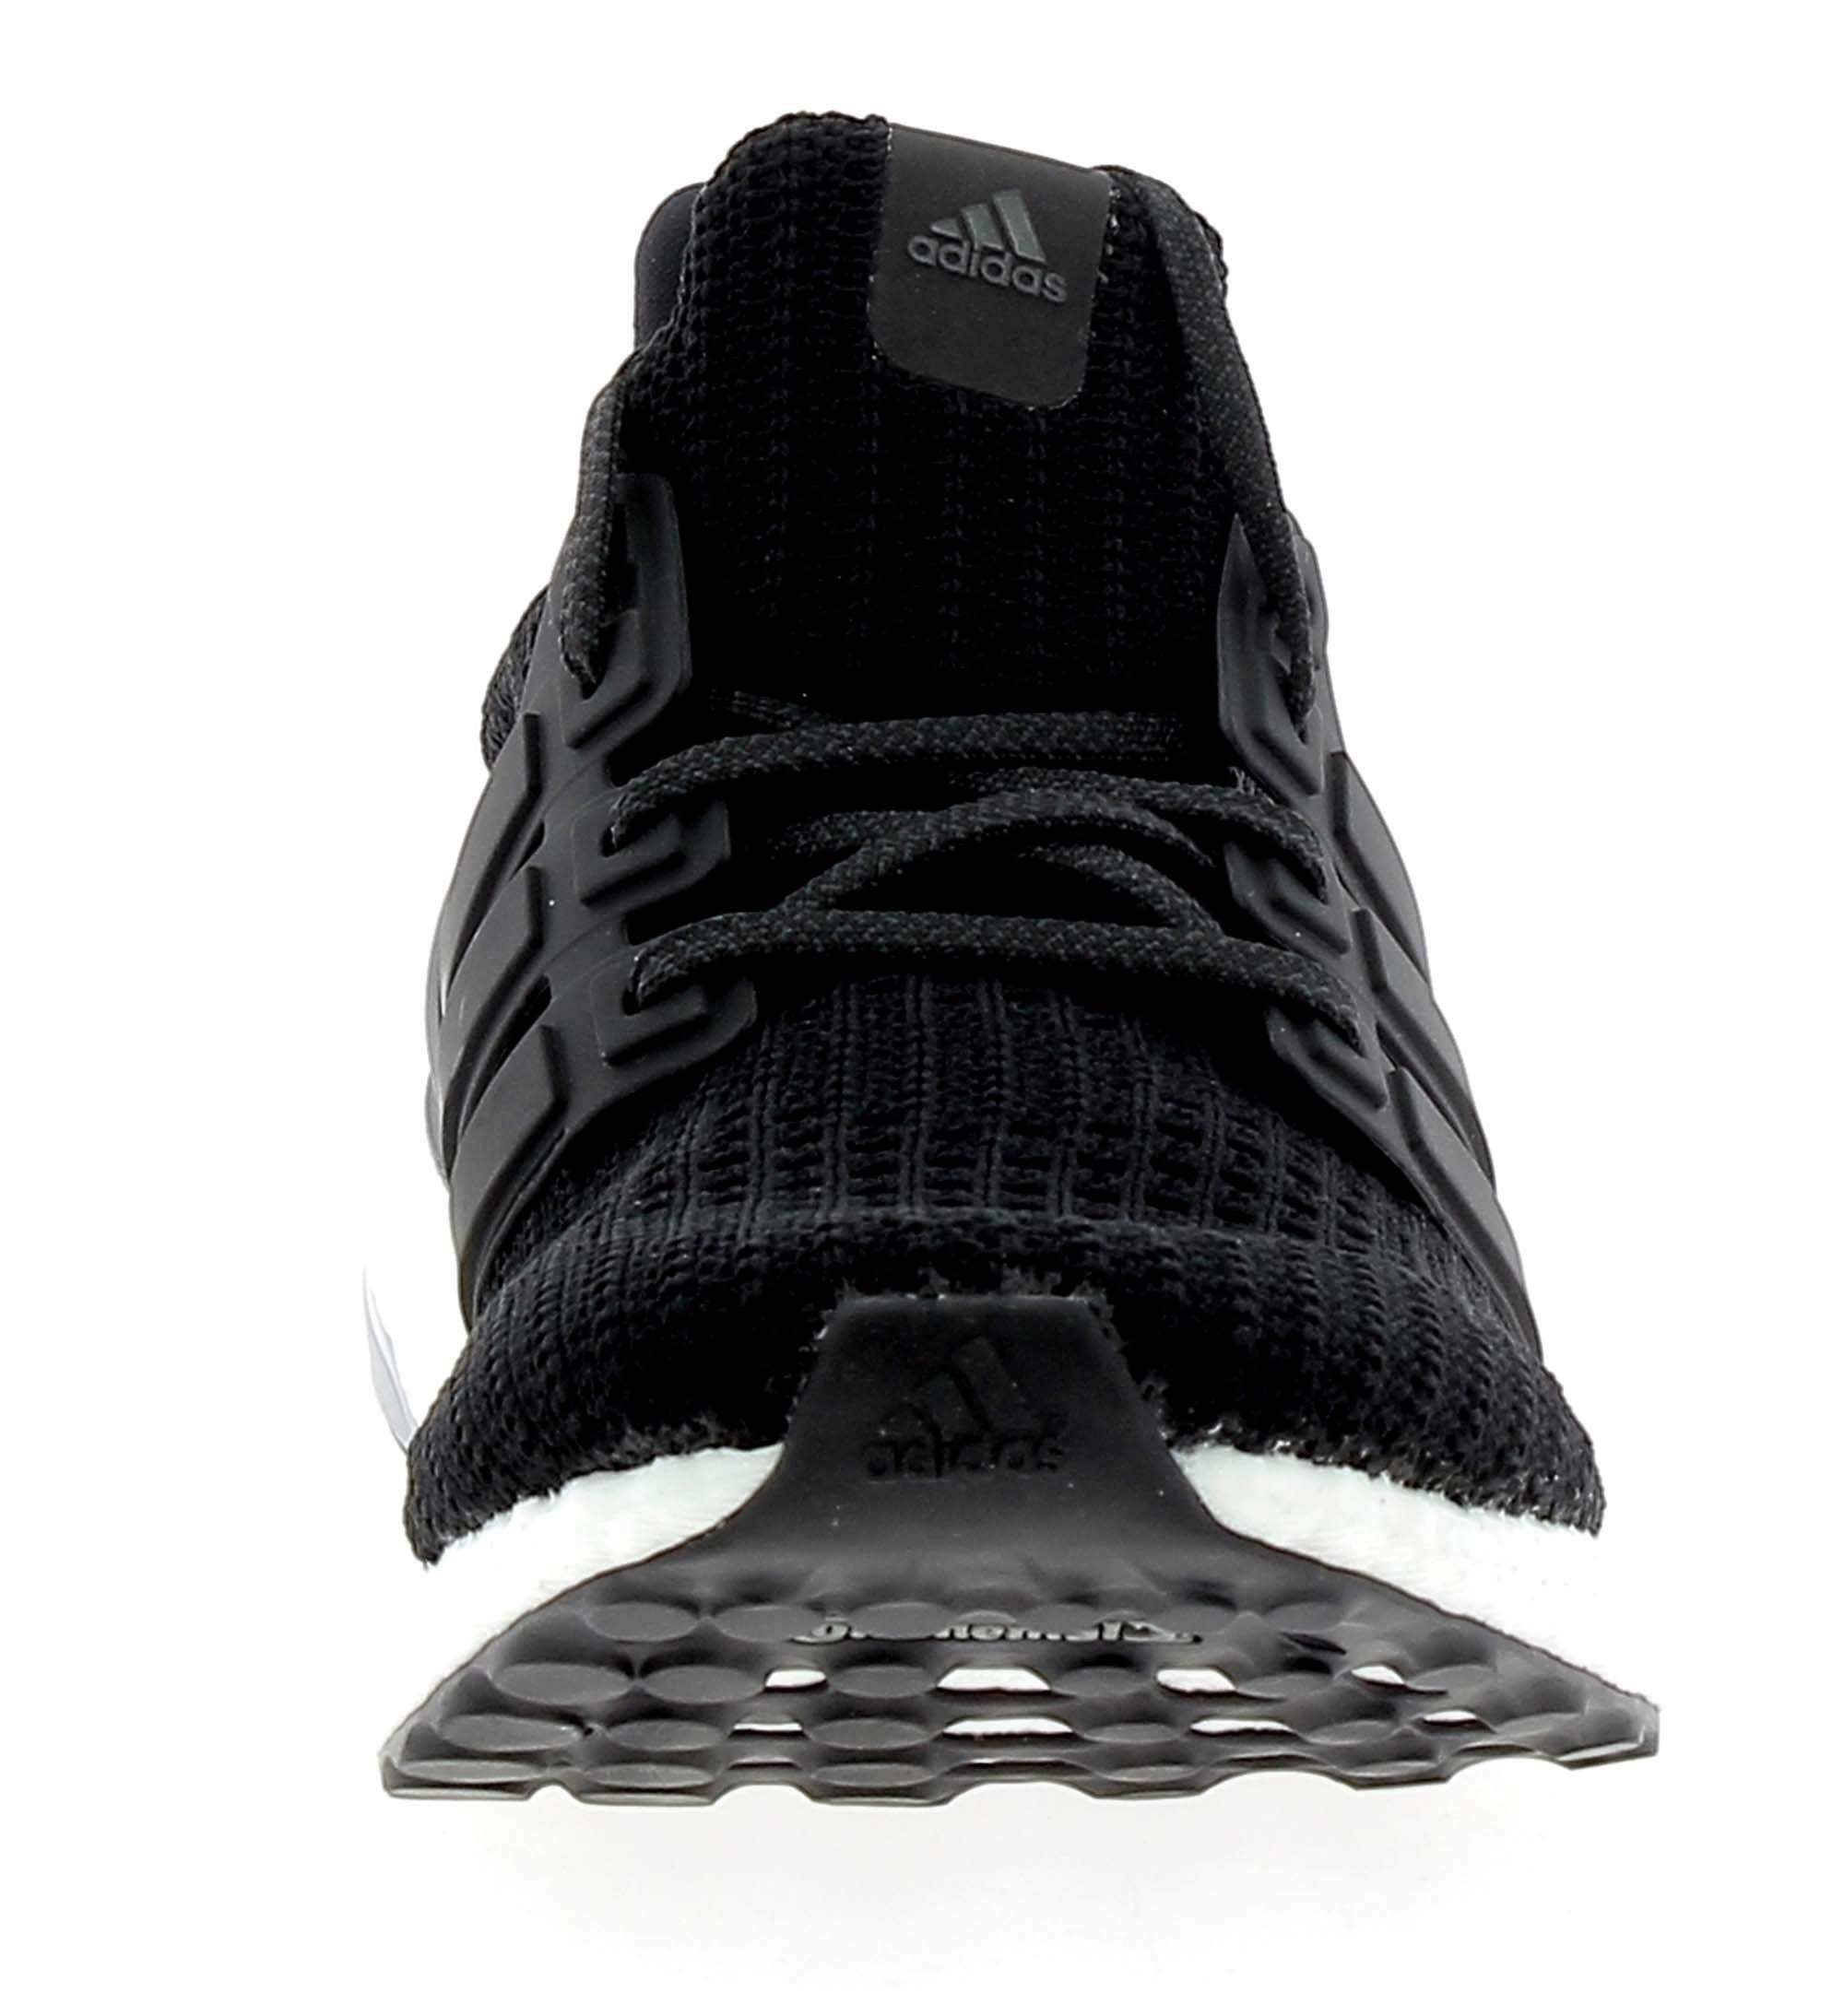 adidas adidas ultraboost scarpe sportive uomo nere bb6166